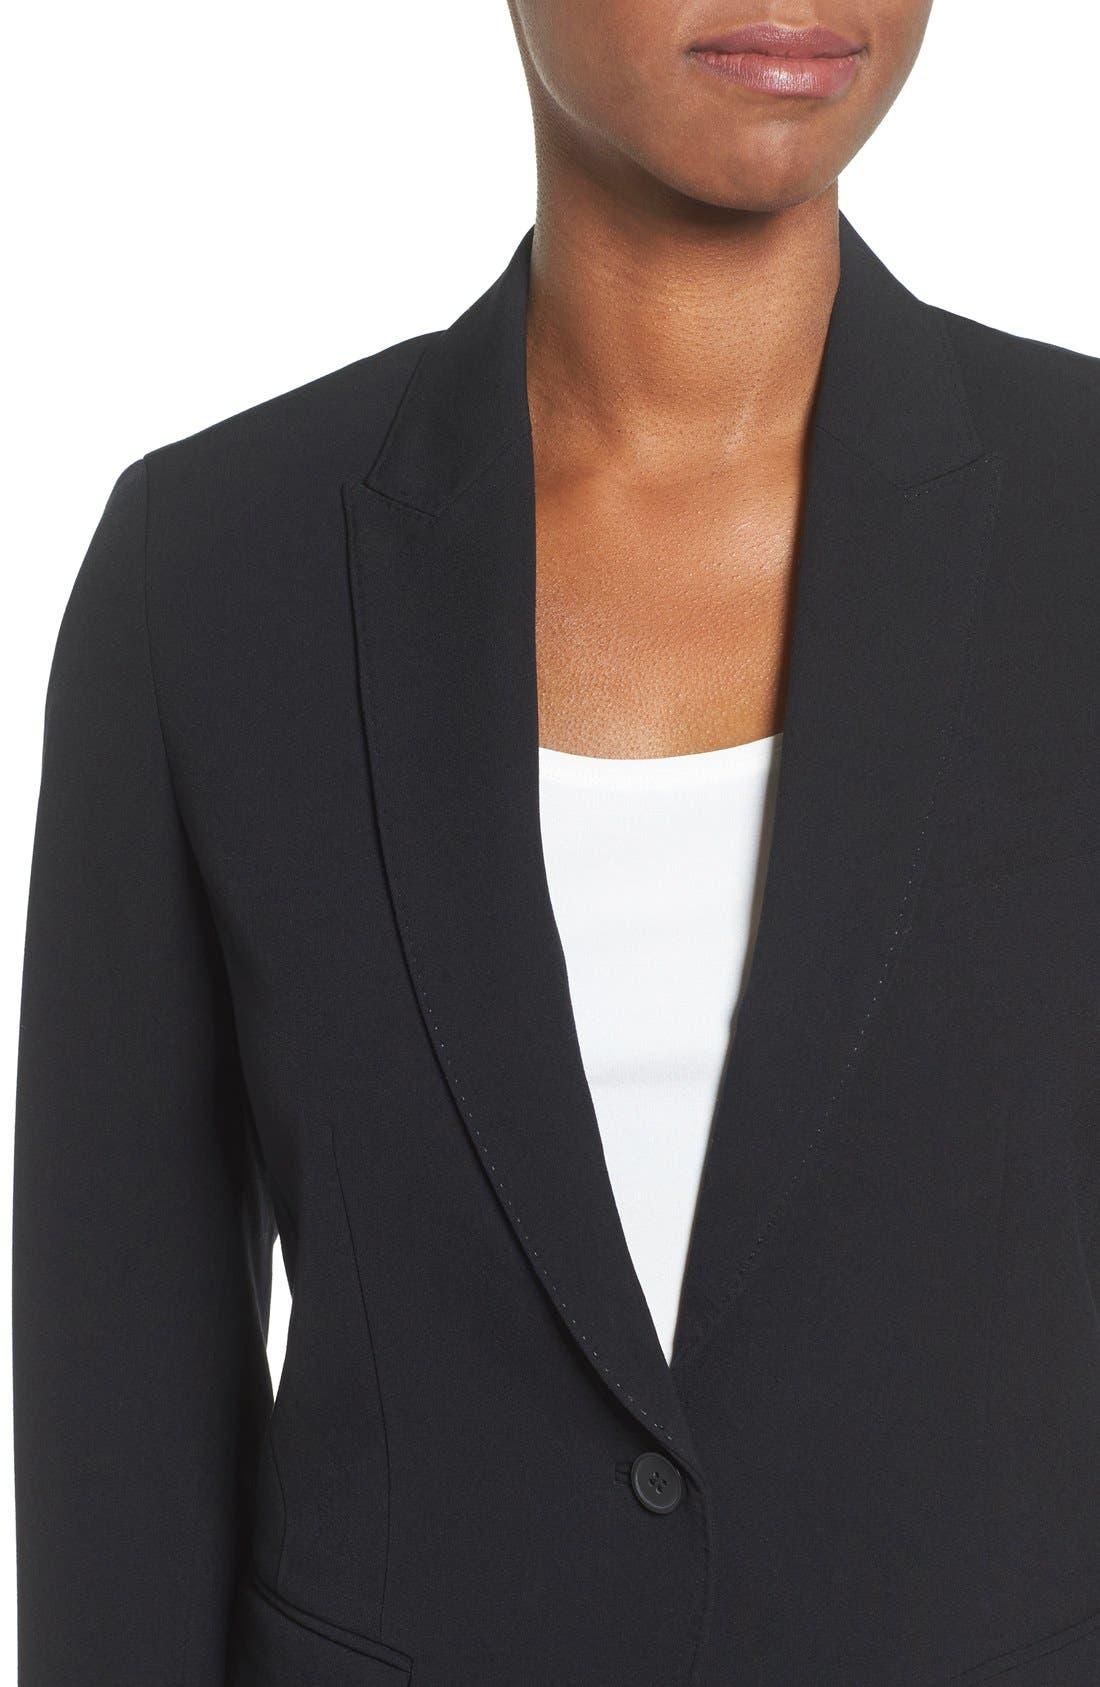 ANNE KLEIN, One-Button Suit Jacket, Alternate thumbnail 4, color, ANNE KLEIN BLACK